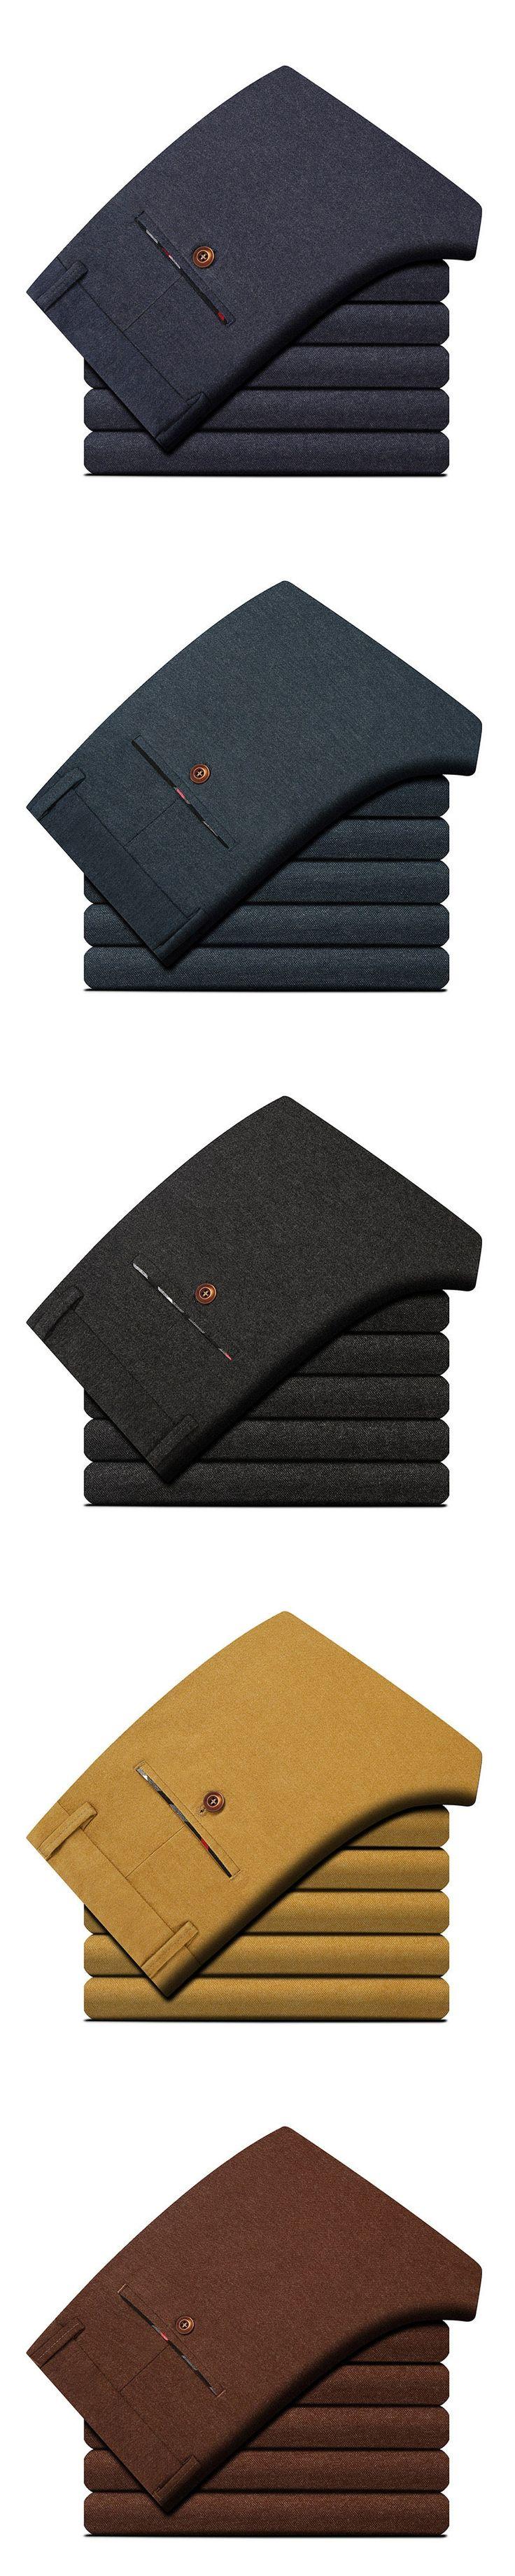 2018 Spring Classic New Men's Elastic Casual Pants Mens Business Dress Slim Jogger Stretch Long Trouser Male Khaki High Quality